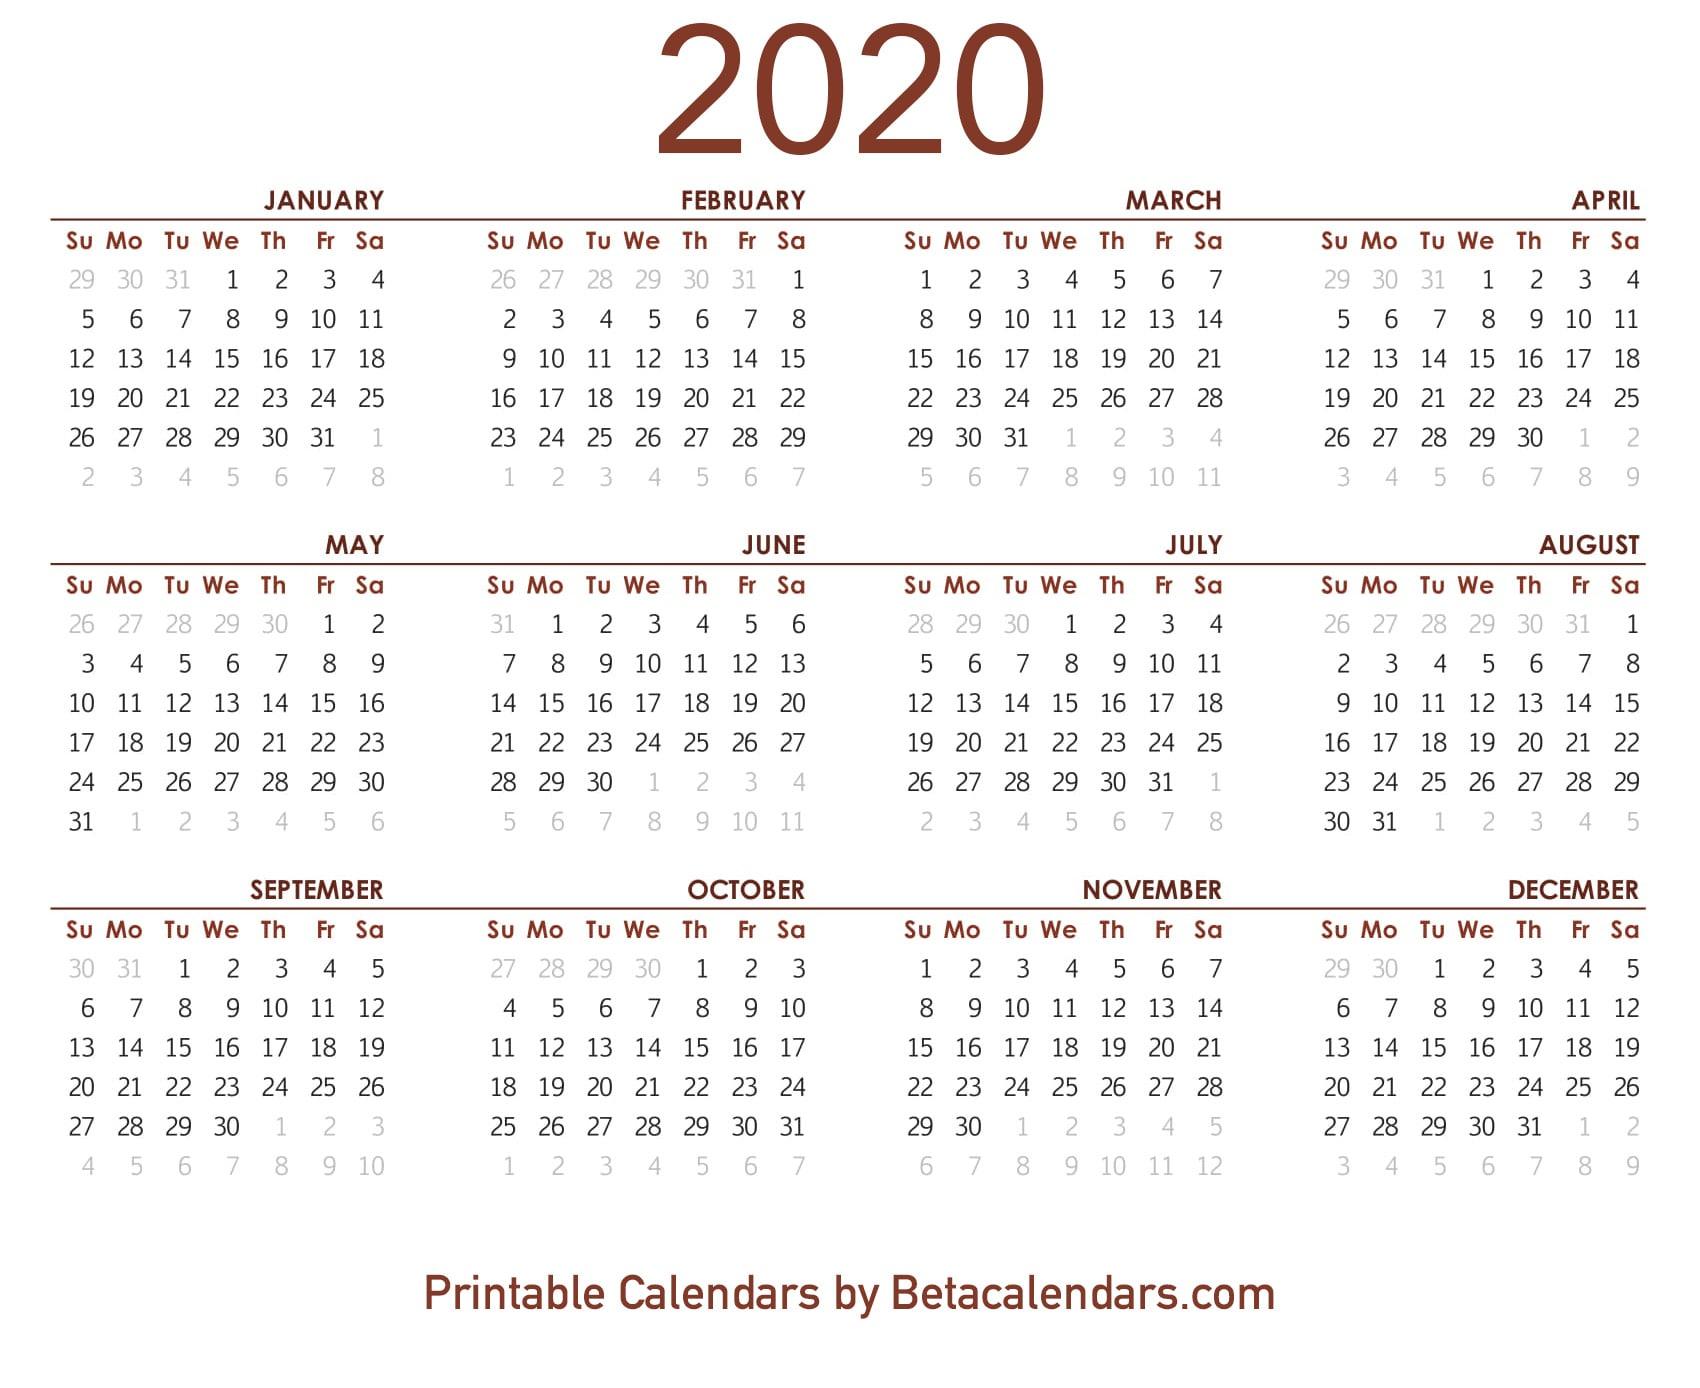 2020 Calendar  Free Printable Yearly Calendar 2020 for November 2020 Calendar Beta Calendars